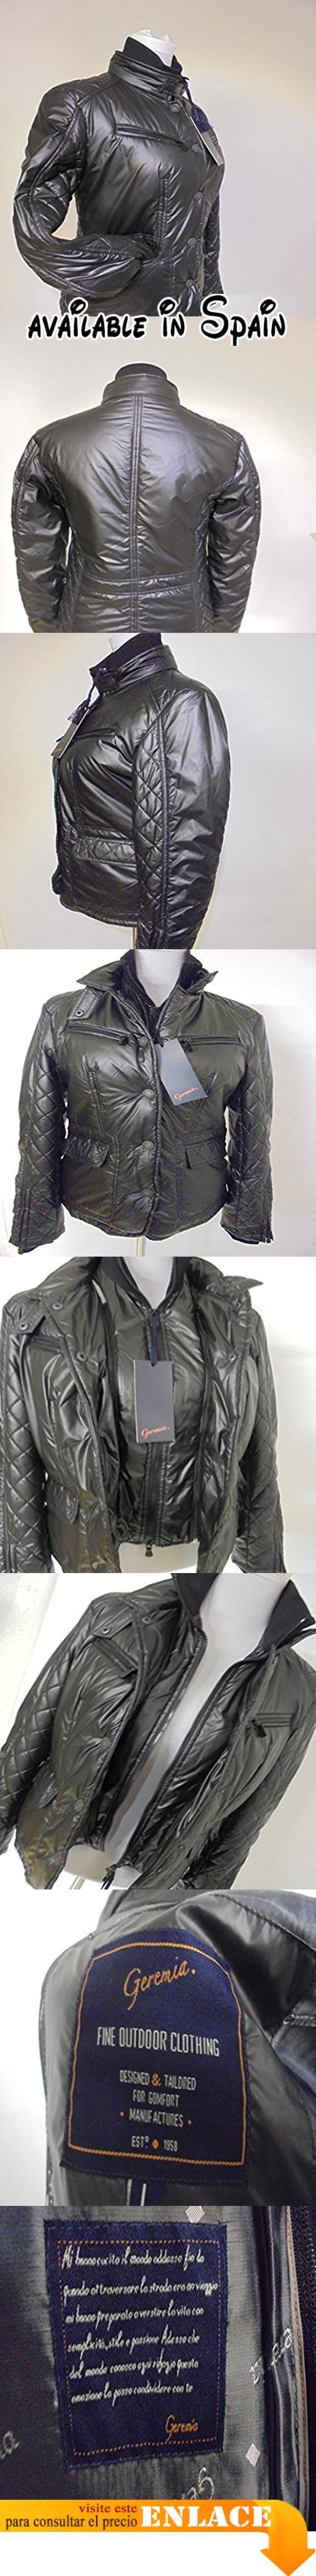 B01986VLJ0 : GEREMIA - Abrigo impermeable - Manga larga - para mujer negro Large.